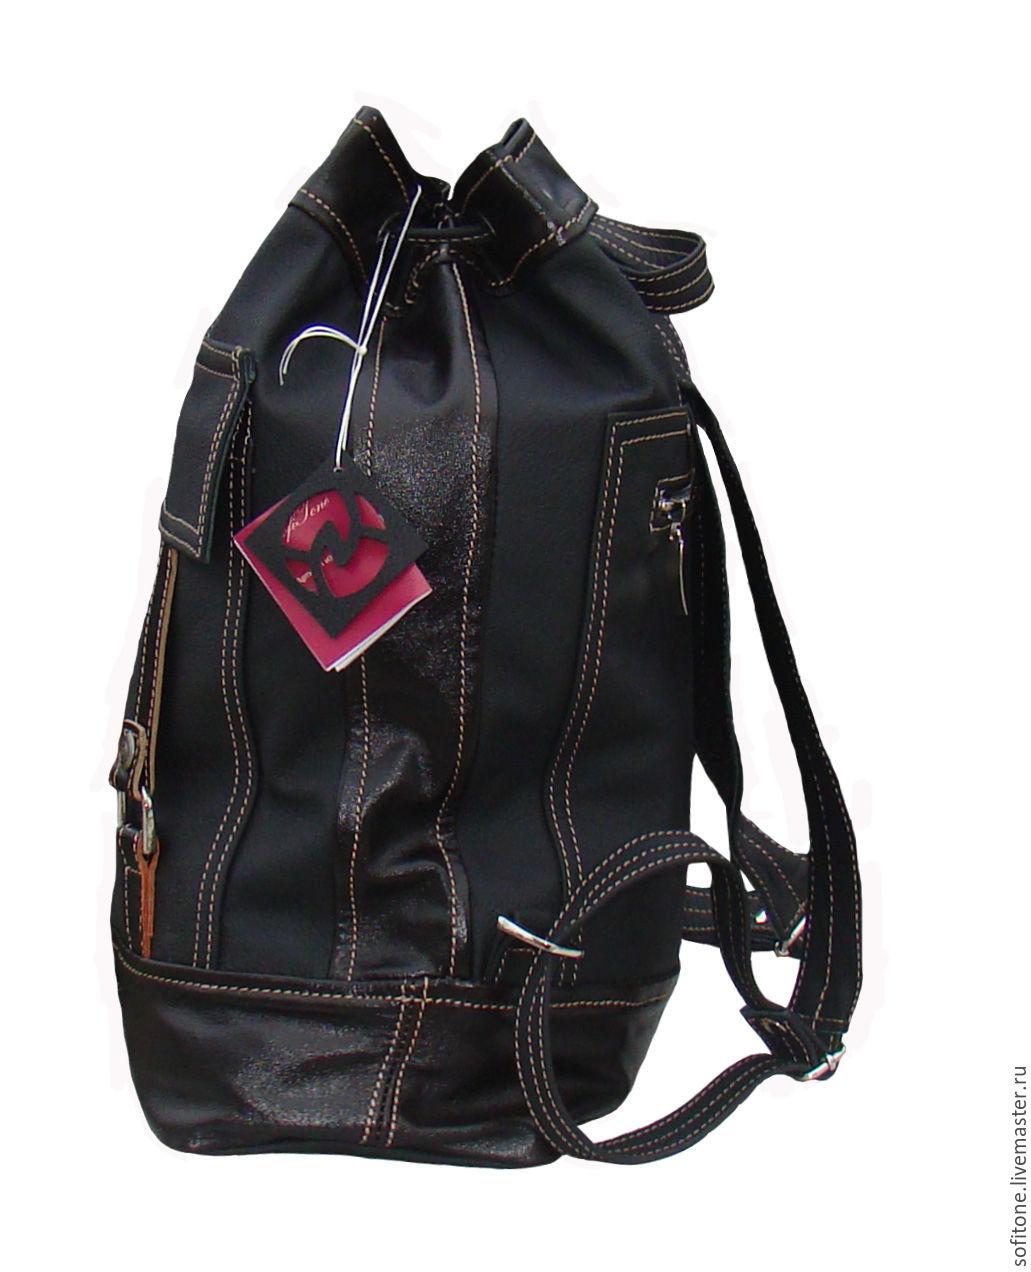 Рюкзаки, торбы чемоданы кельвин кляйн